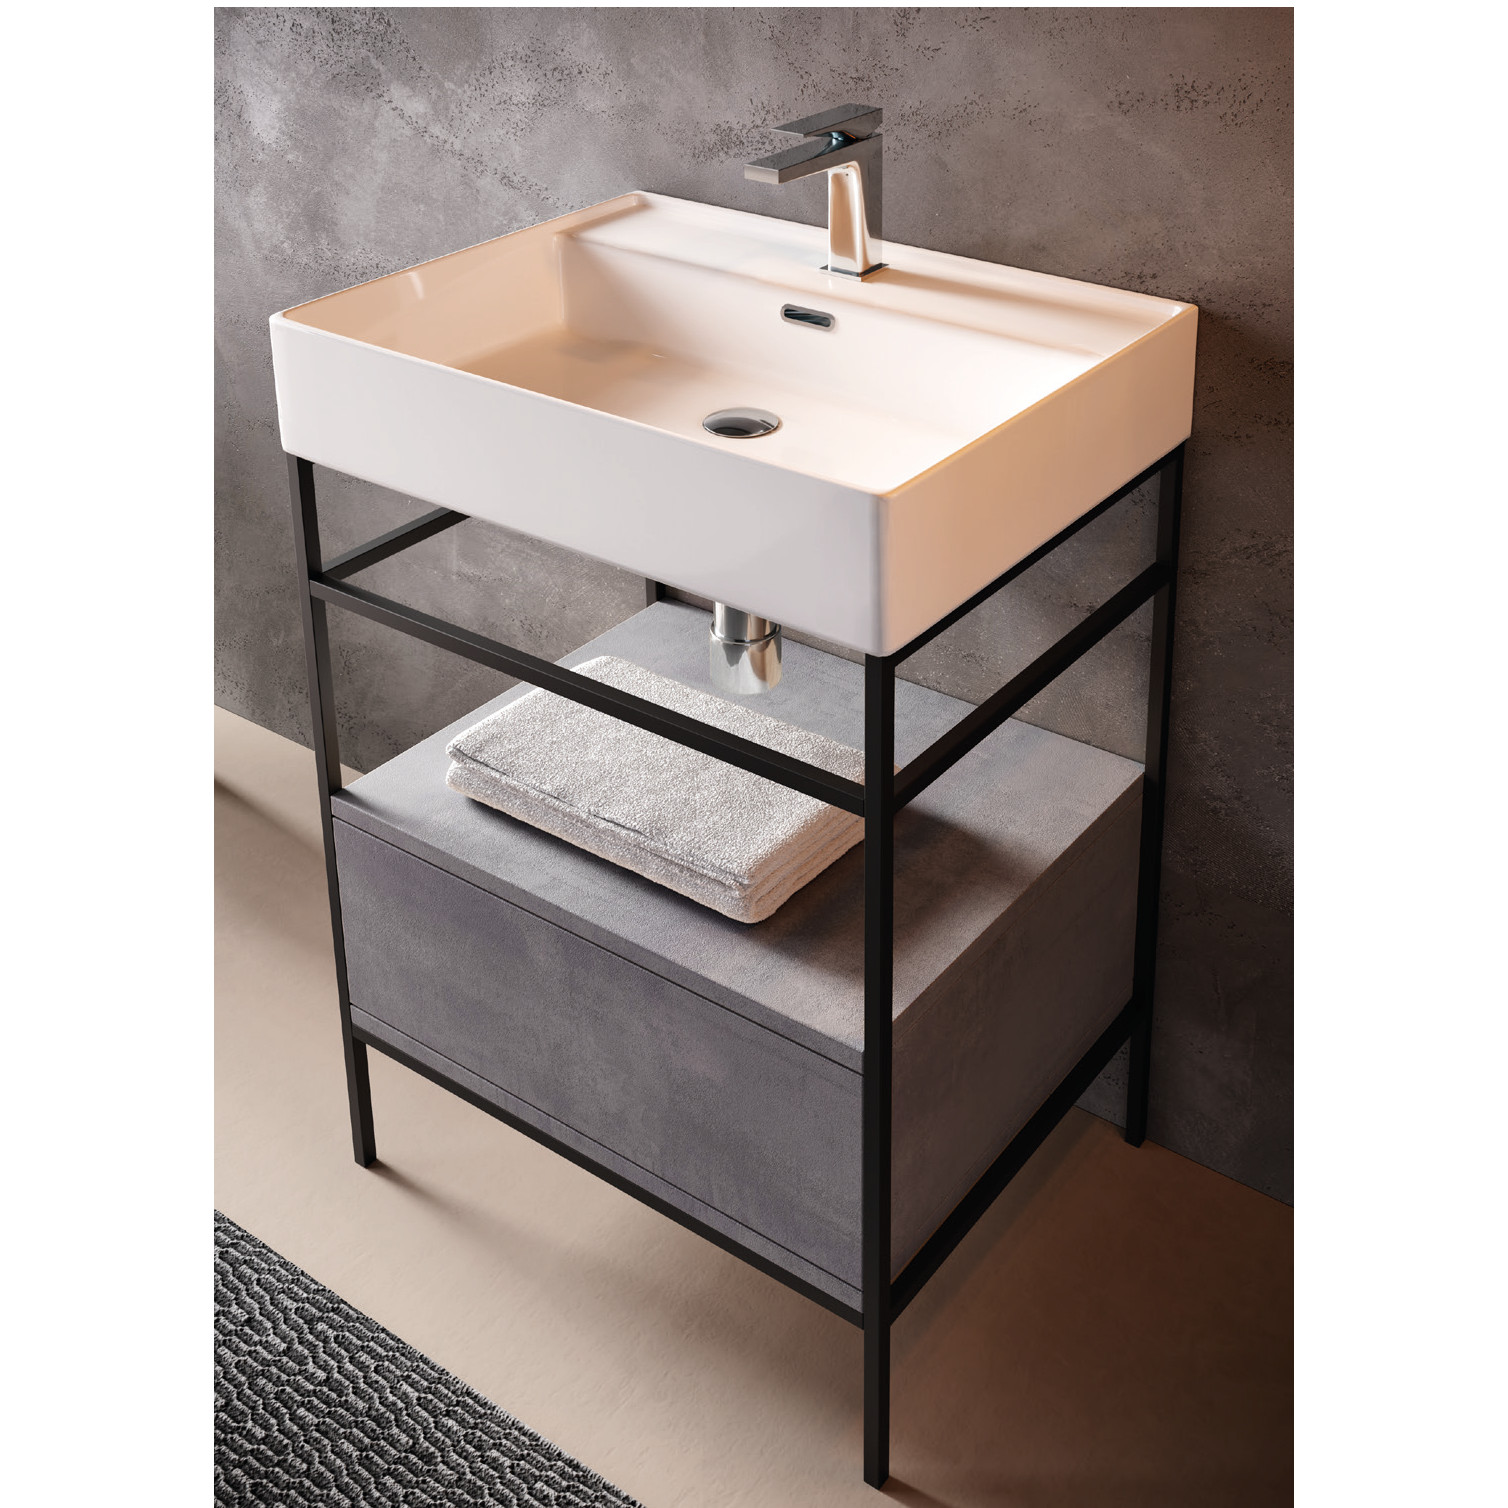 Countertop/Wall-hung washbasin cm 46x61 Faster Kiub